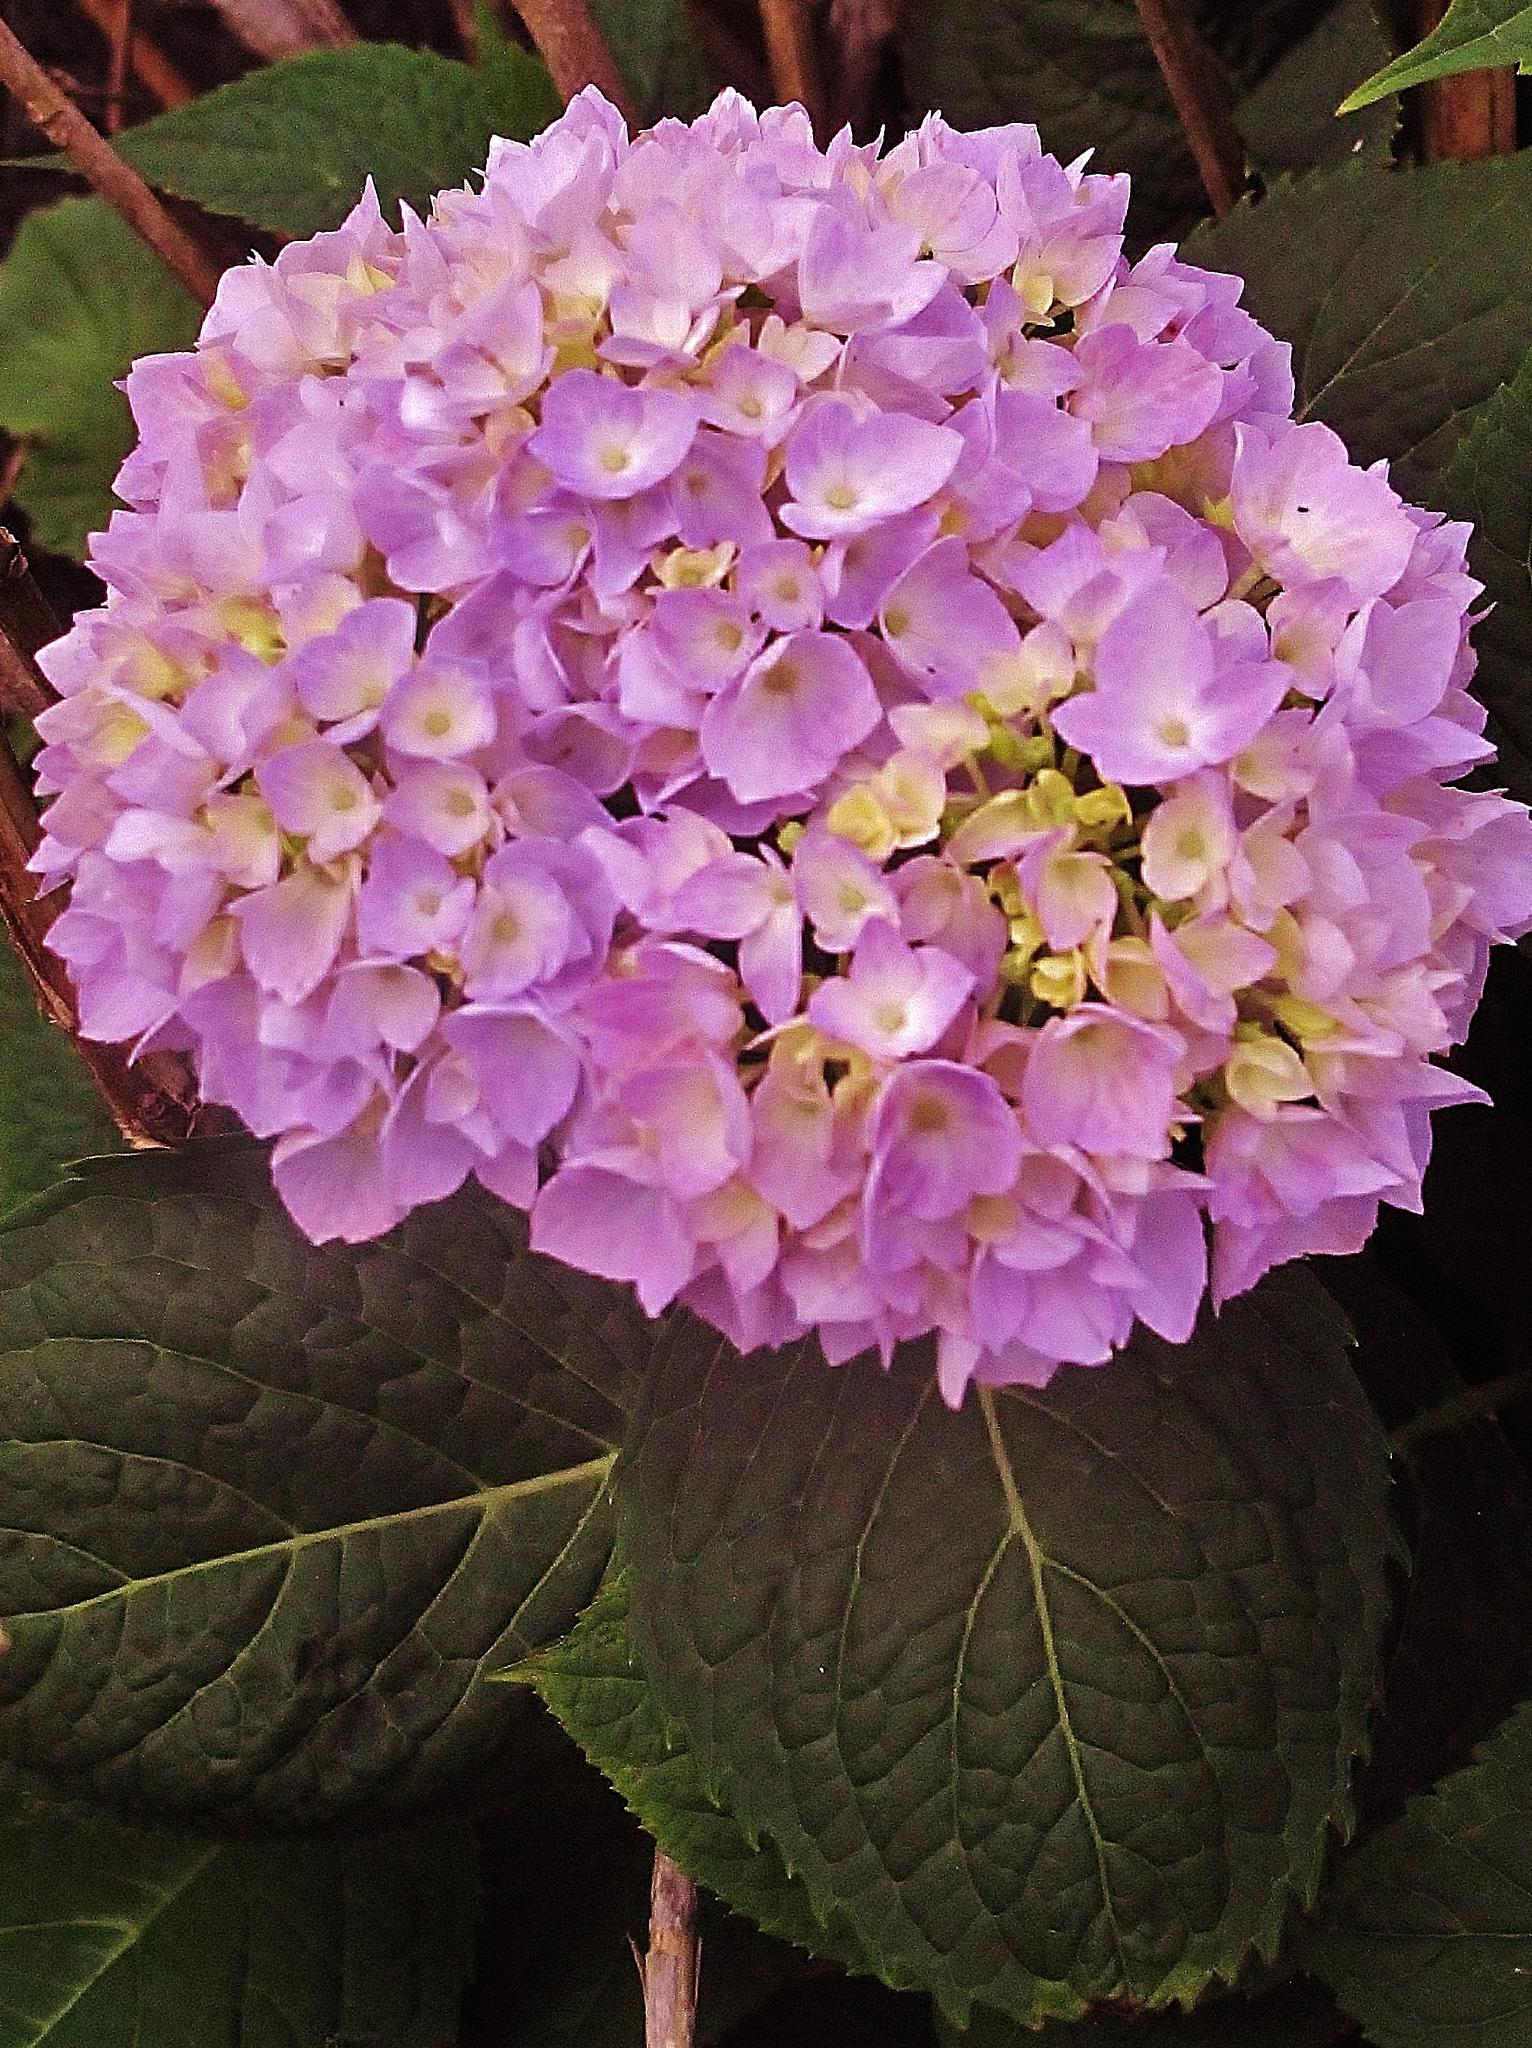 flower by paulcrimi178